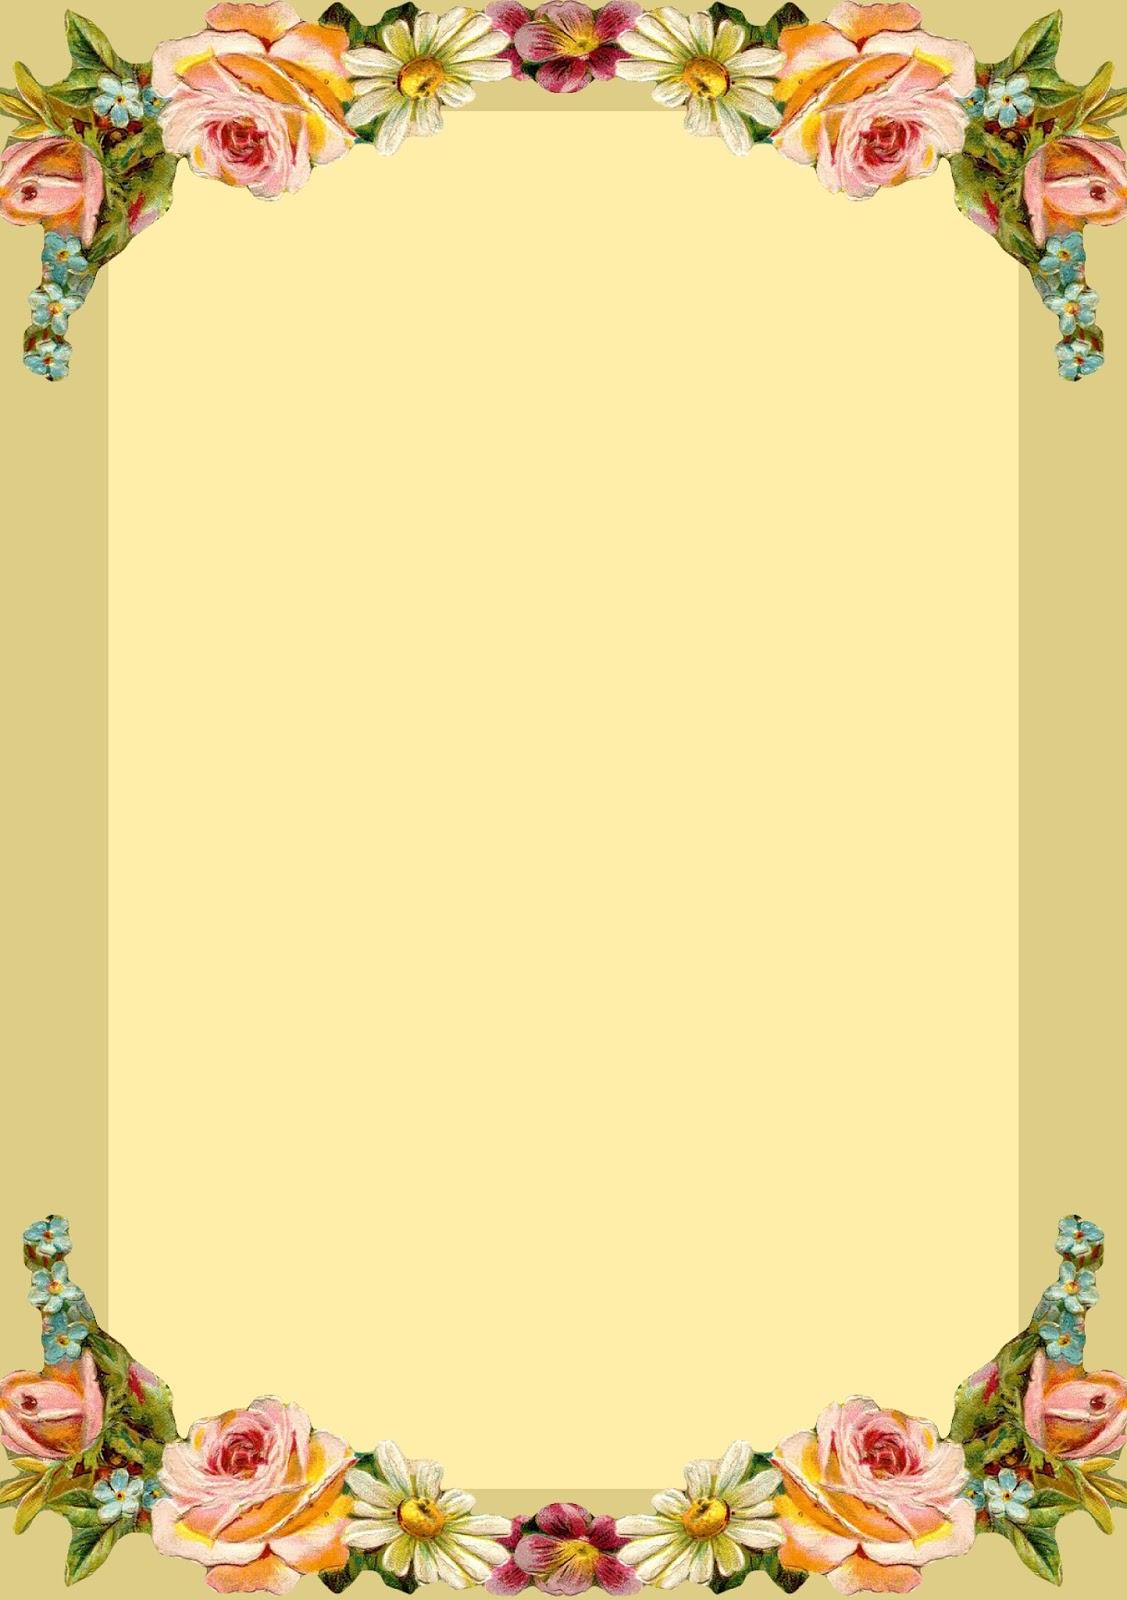 Flower Border For A4 Size Paper Yolarnetonic